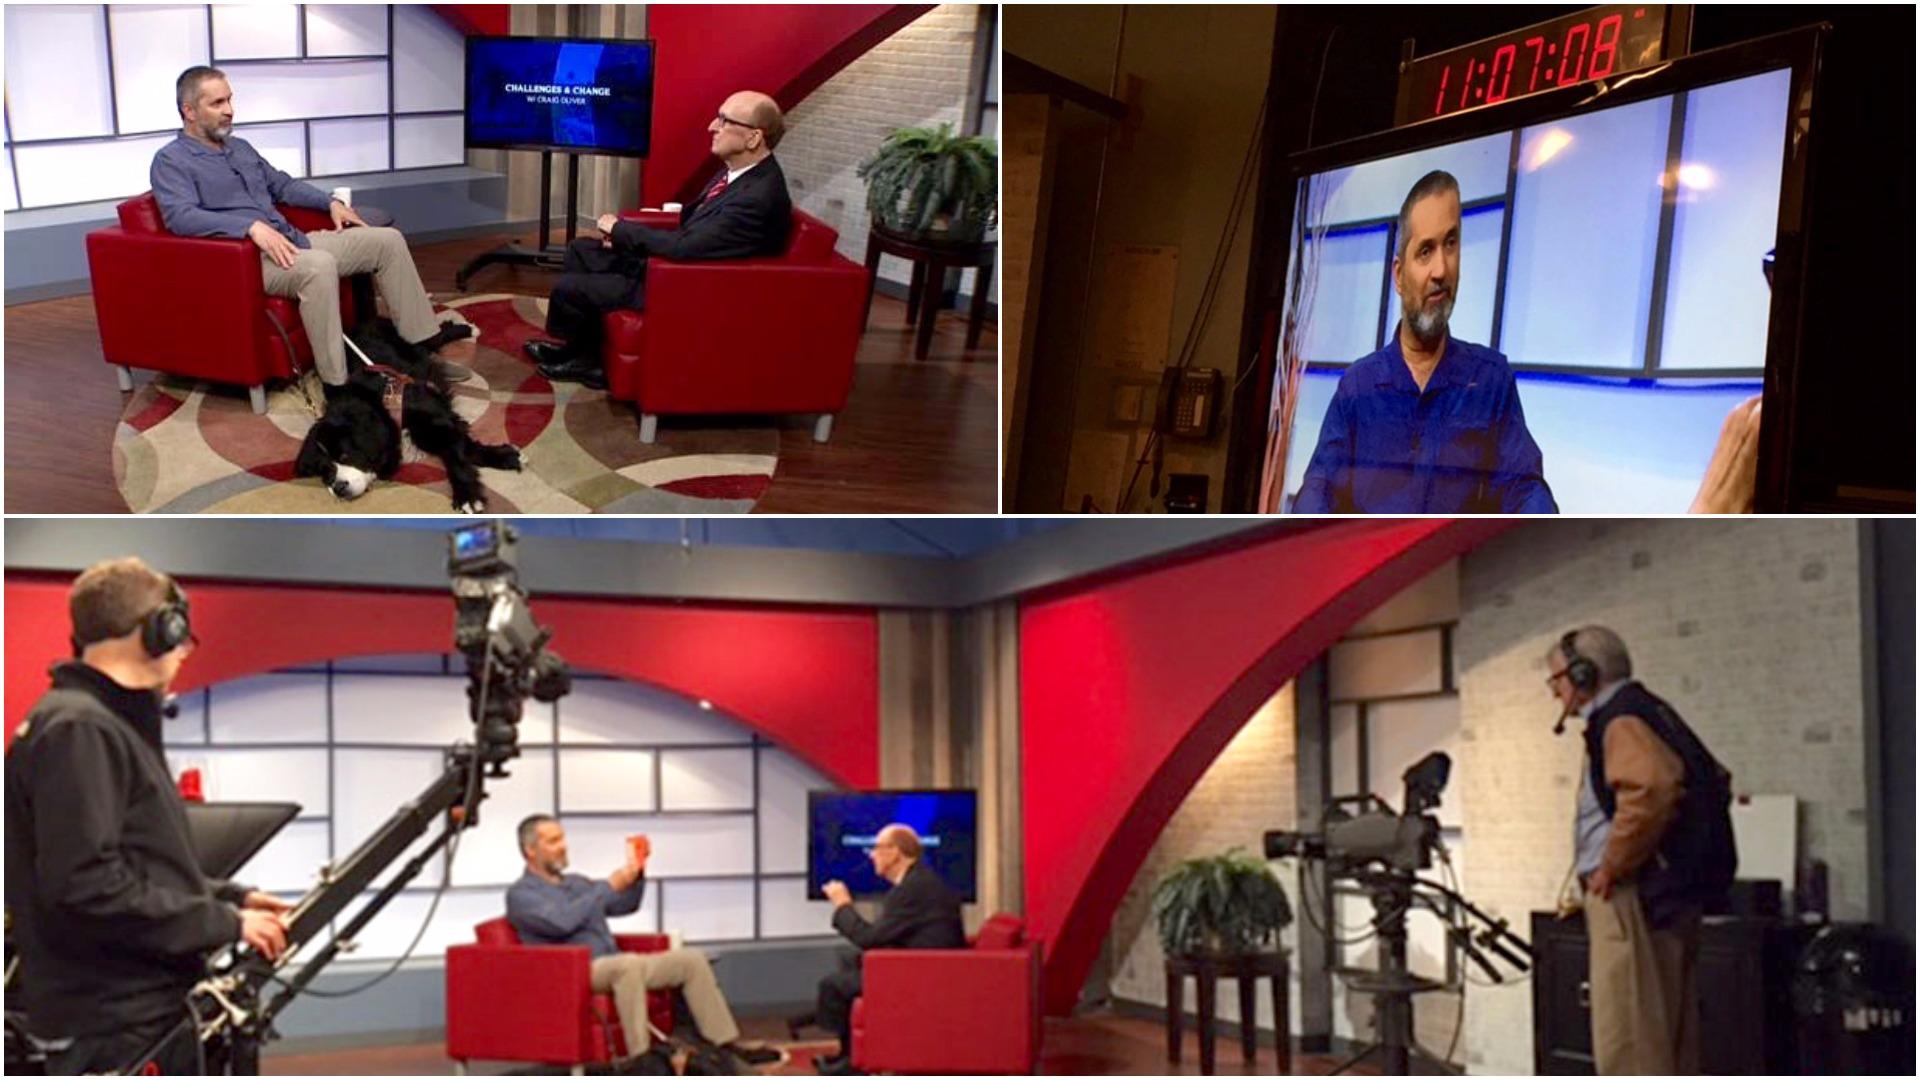 Blue Fish Radio: TV journalist Craig Oliver interviews Lawrence Gunther